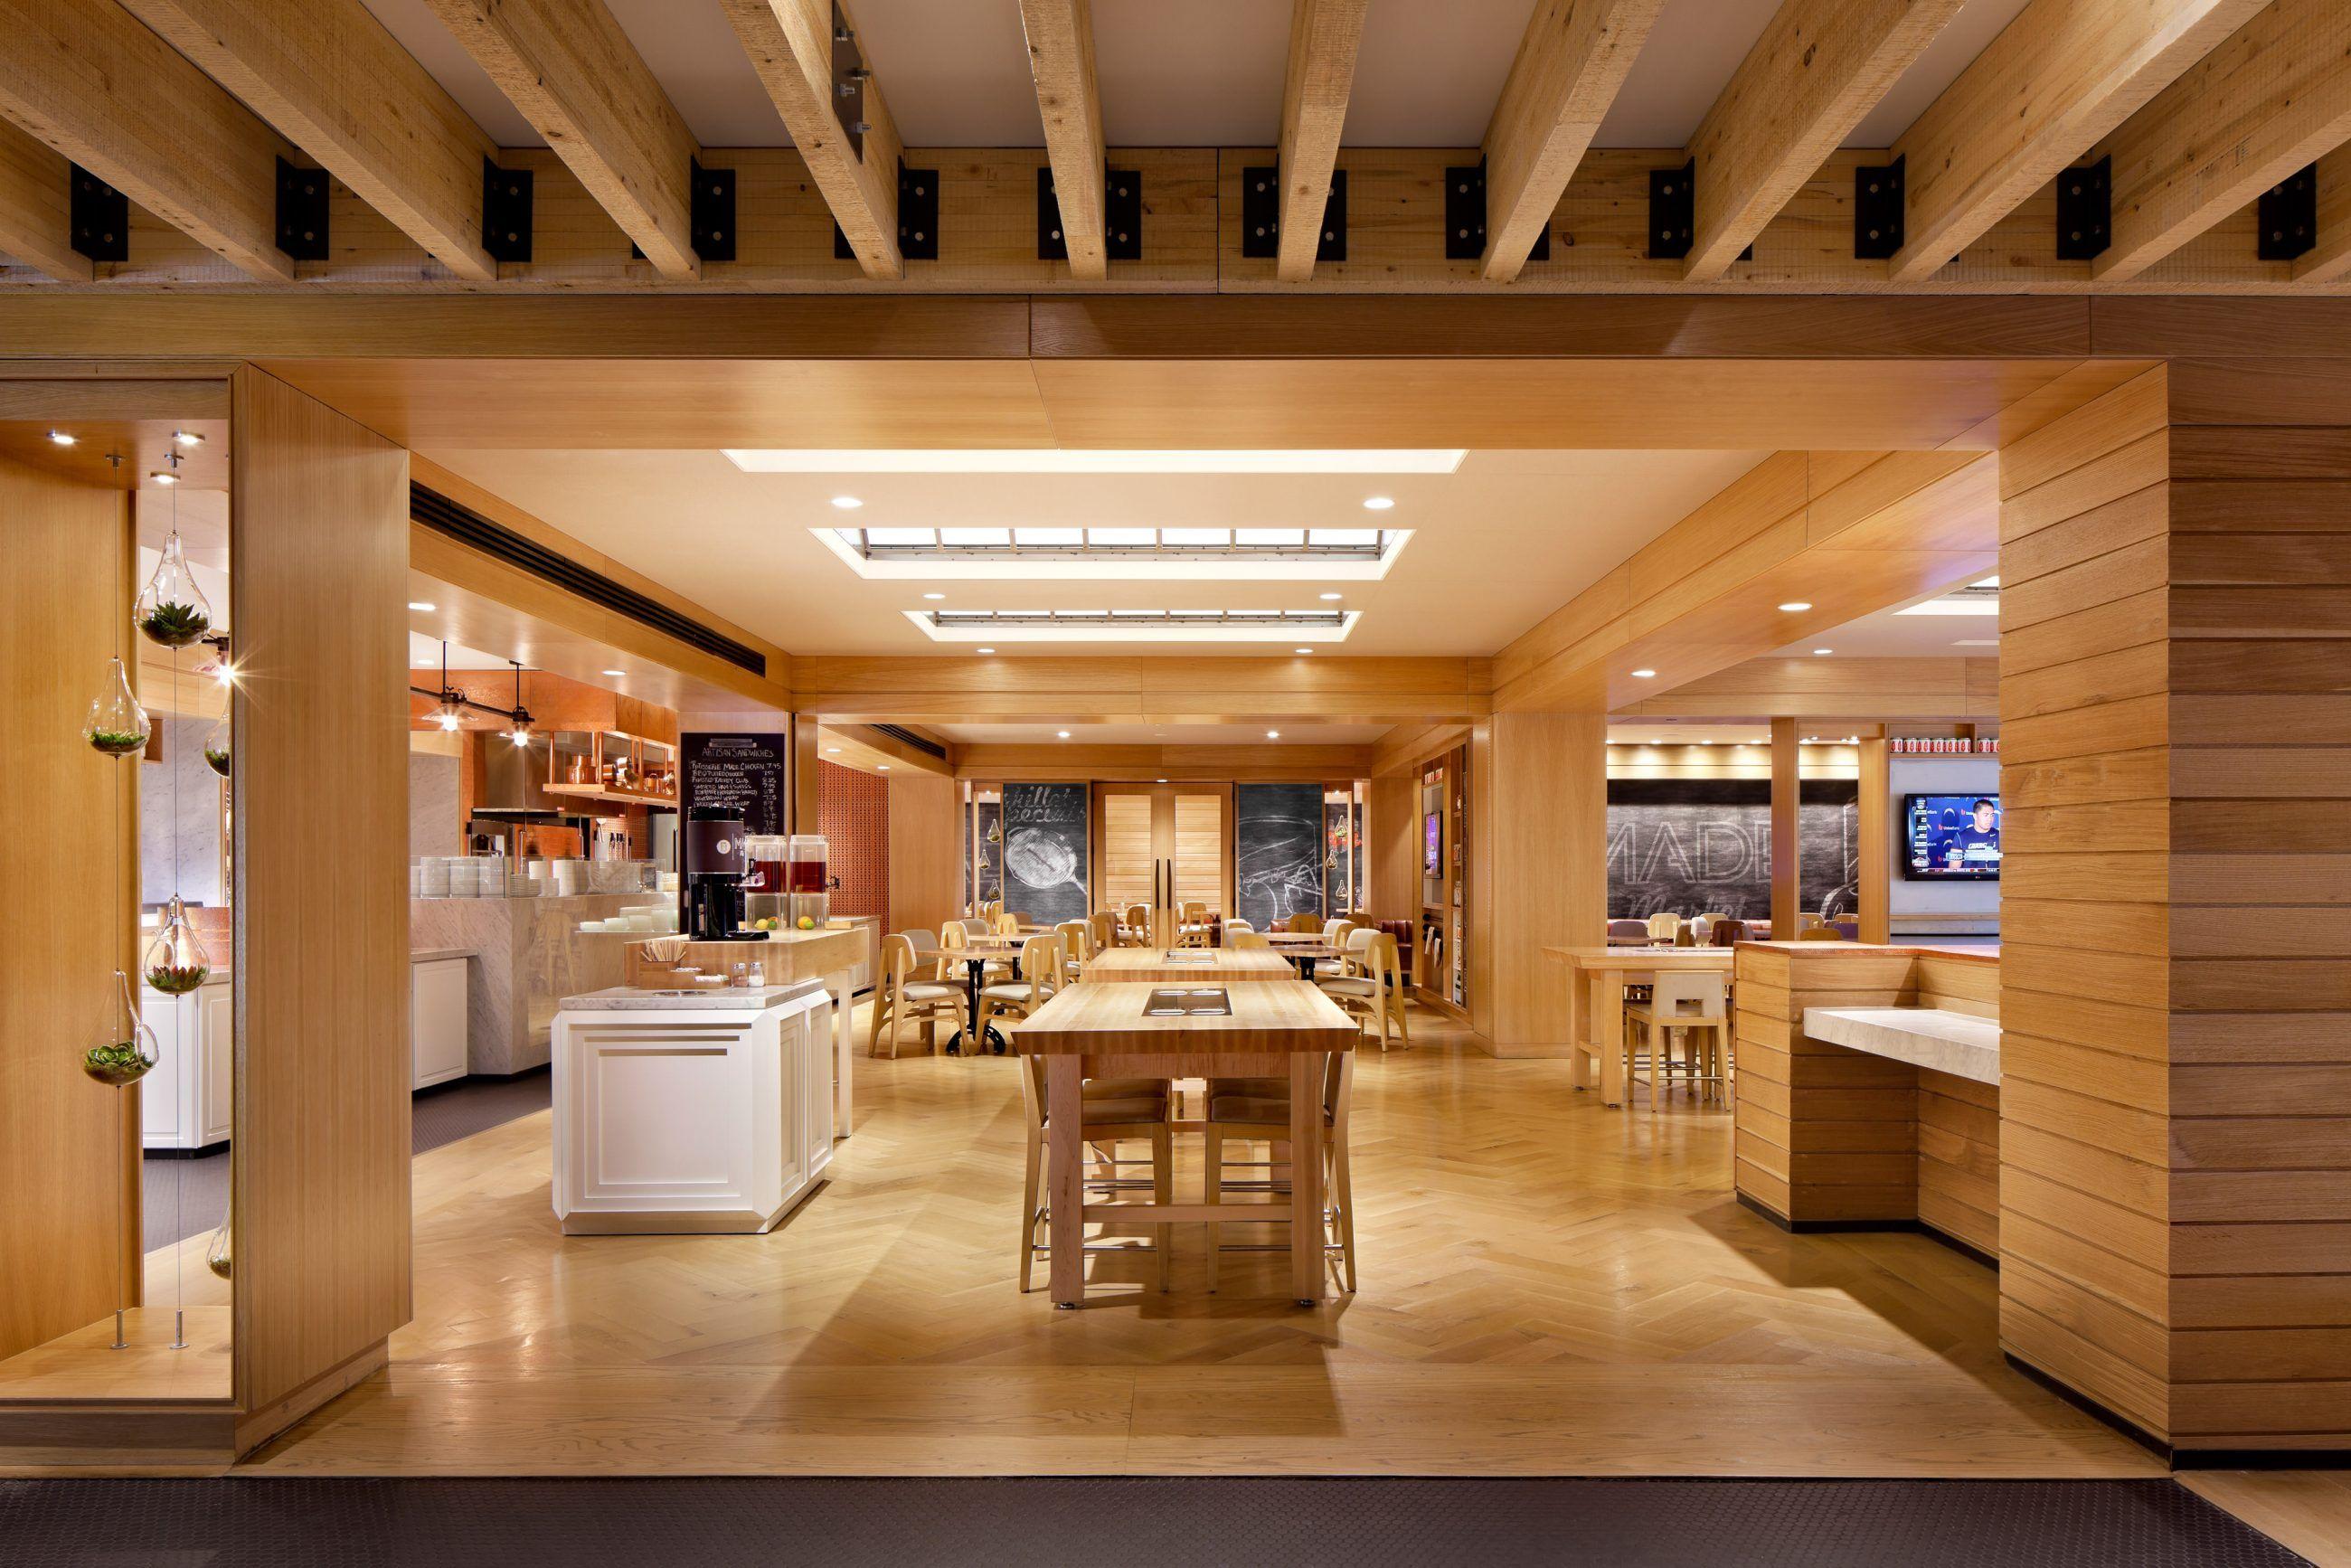 MADE Market Prototype - Hilton DoubleTree Tulsa, OK | Hospitality ...